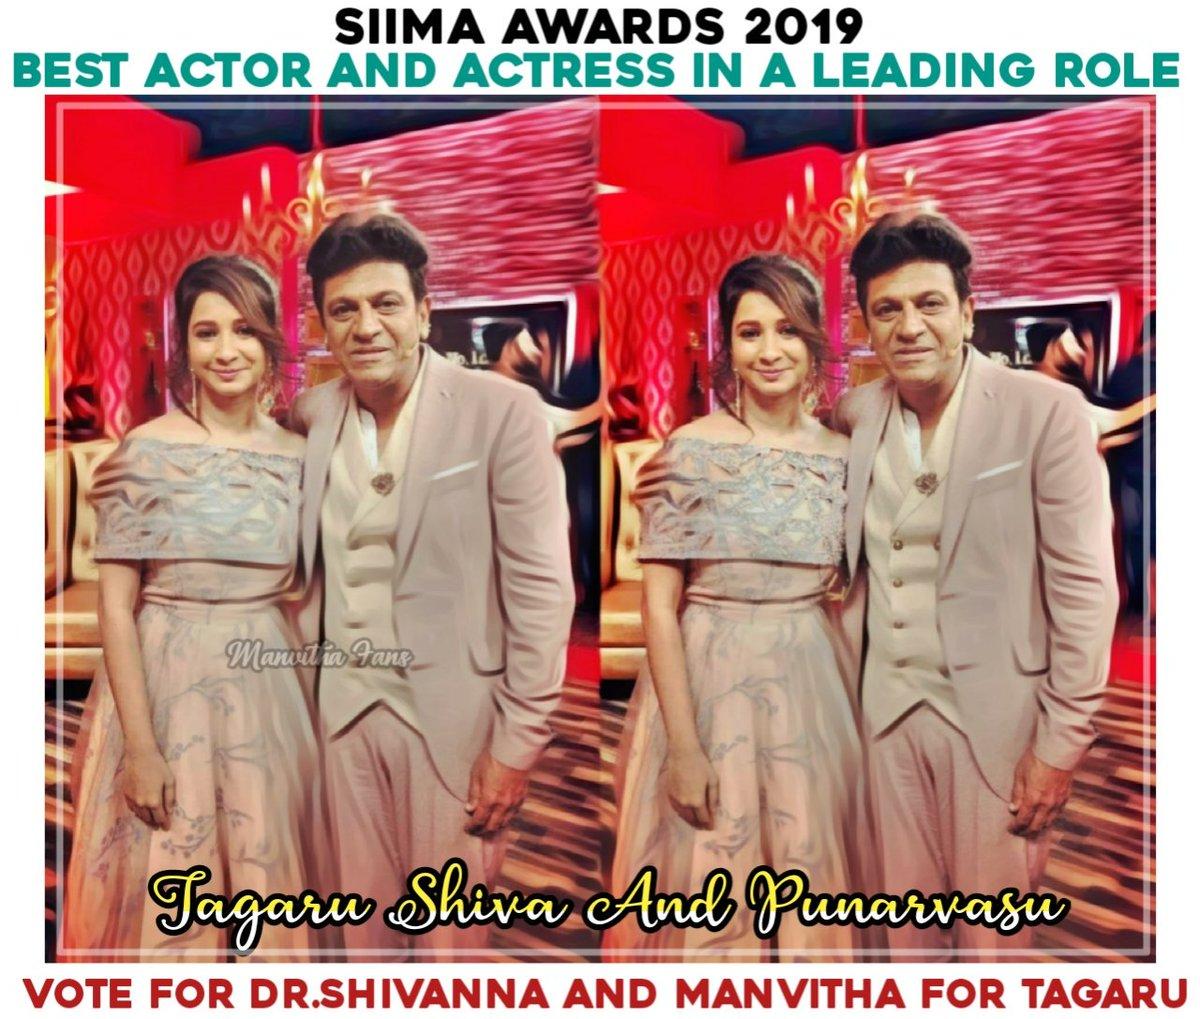 SIIMA Awards 2019 😍 Vote For #DrShivanna And #Manvitha Mam